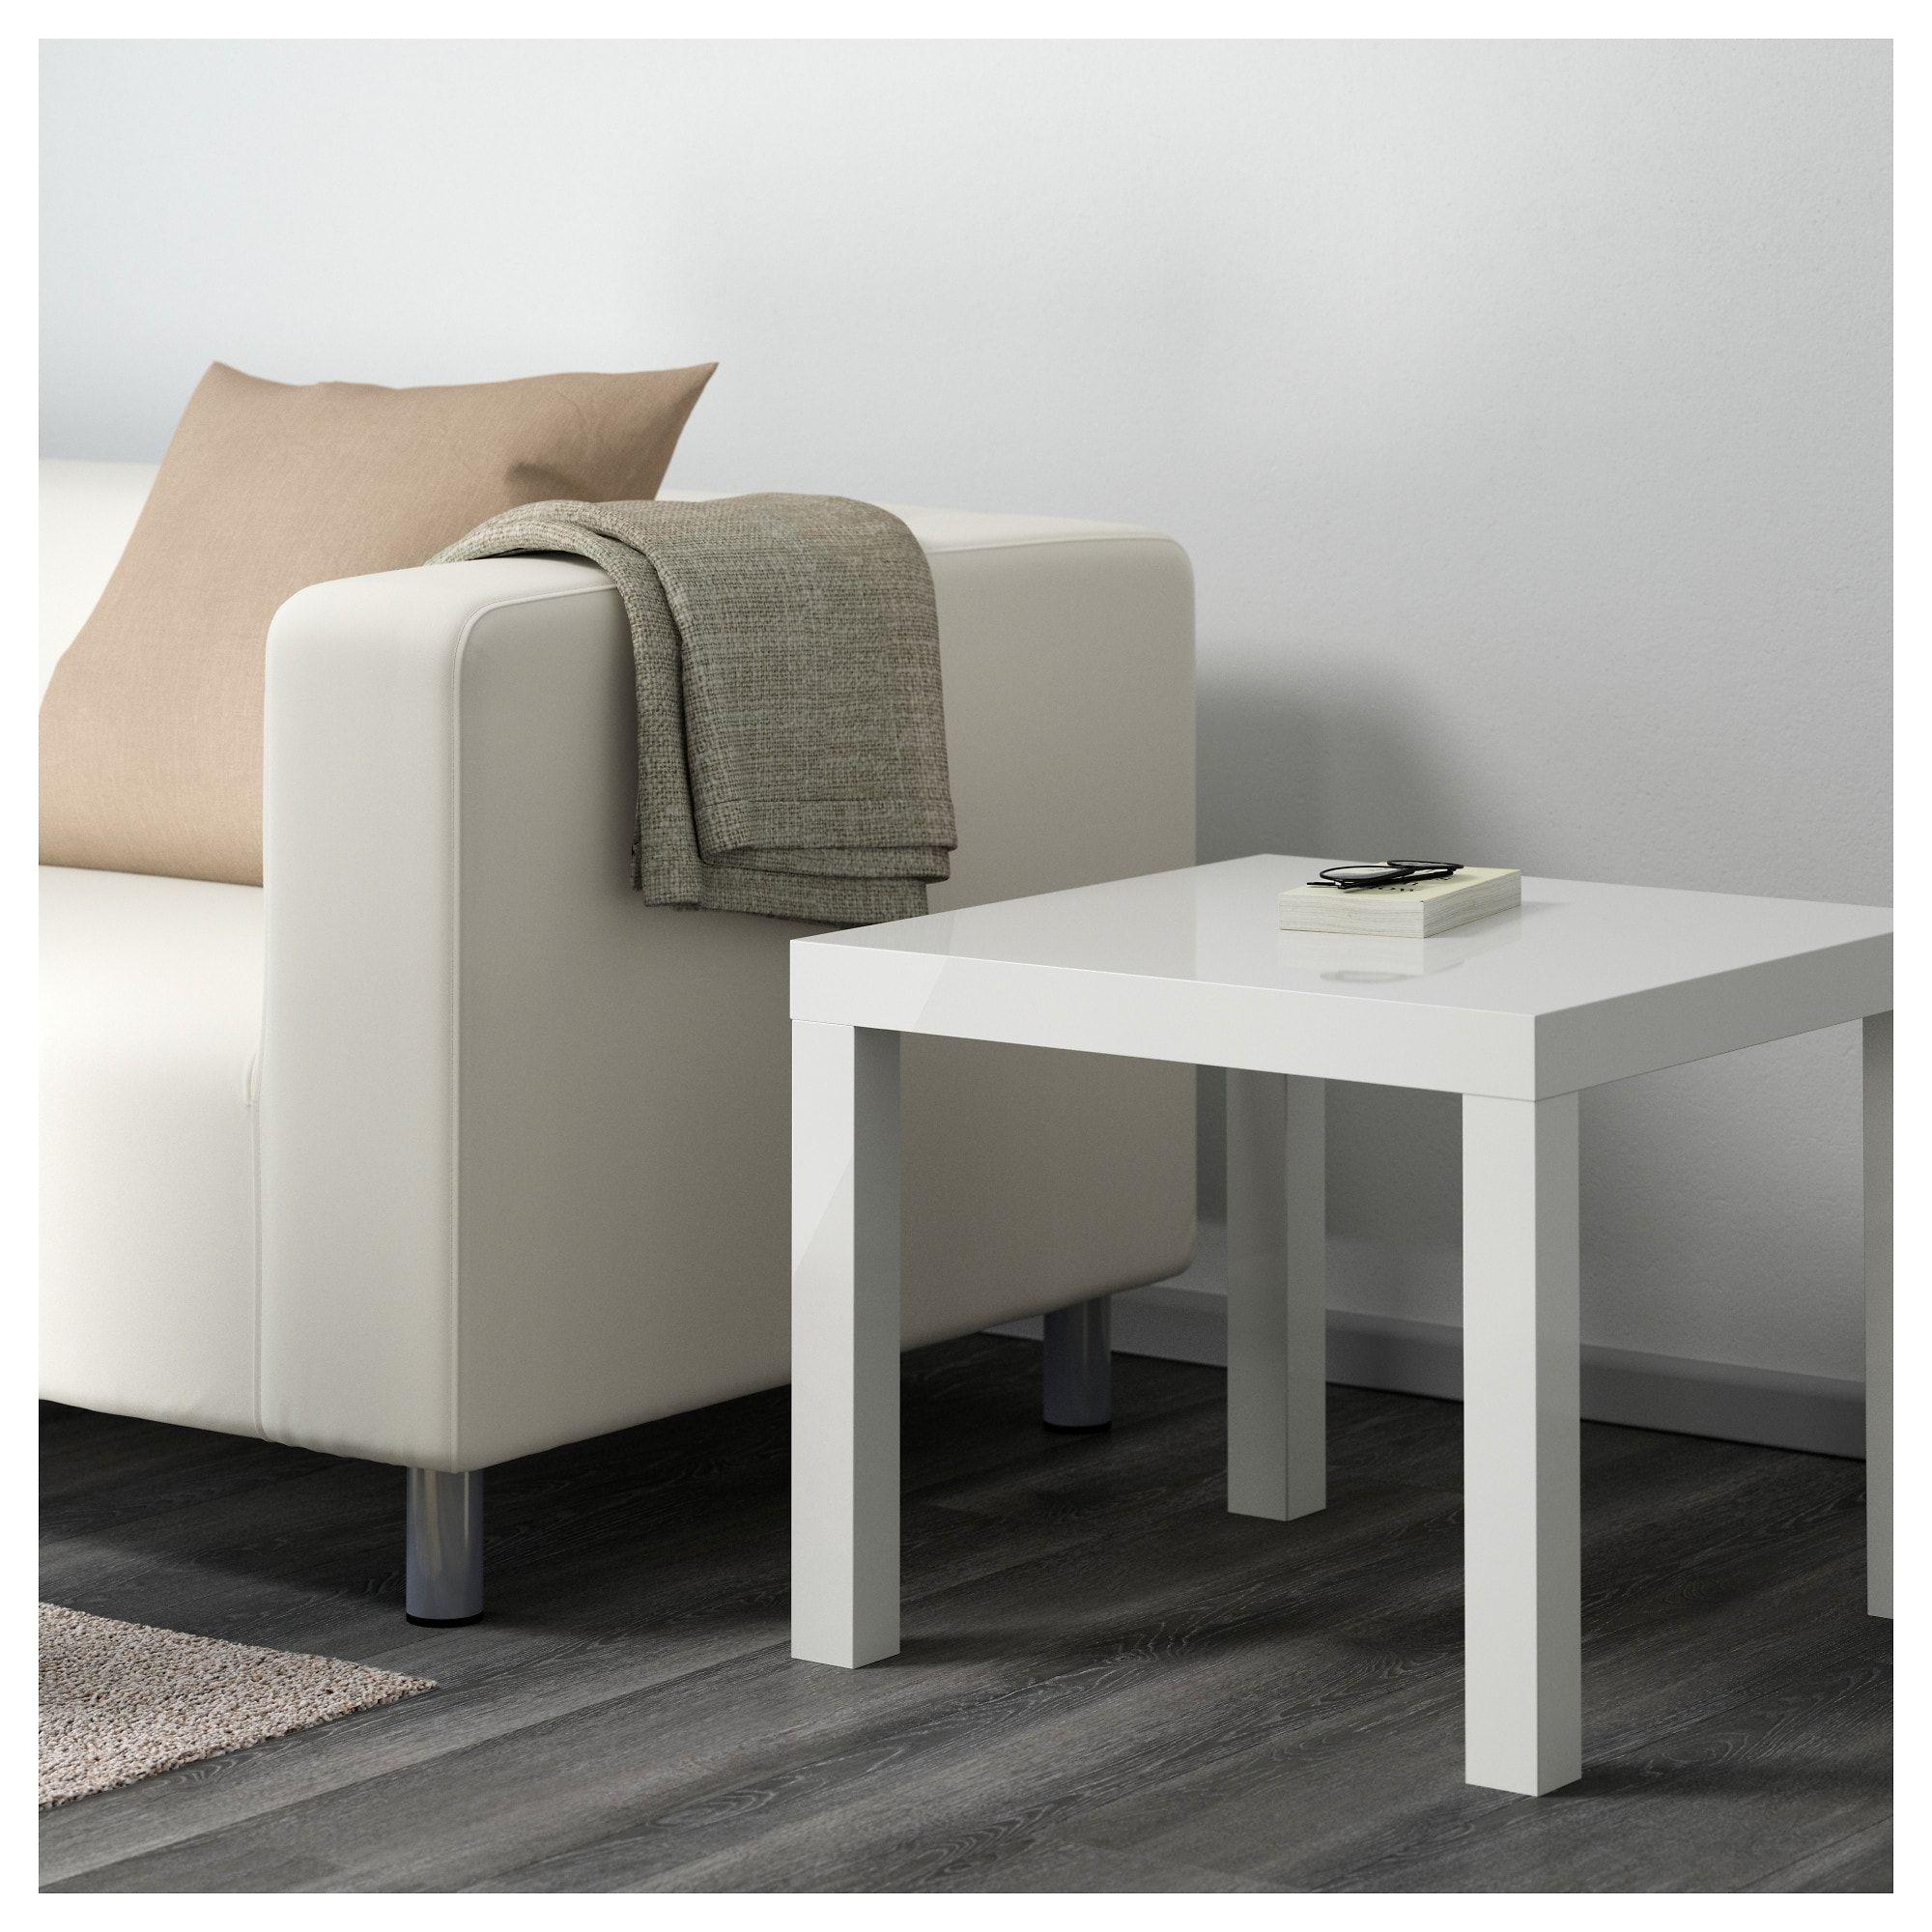 Lack Table D Appoint Ultrabrillant Blanc 21 5 8x21 5 8 55x55 Cm Table D Appoint Table D Appoint Ikea Ikea